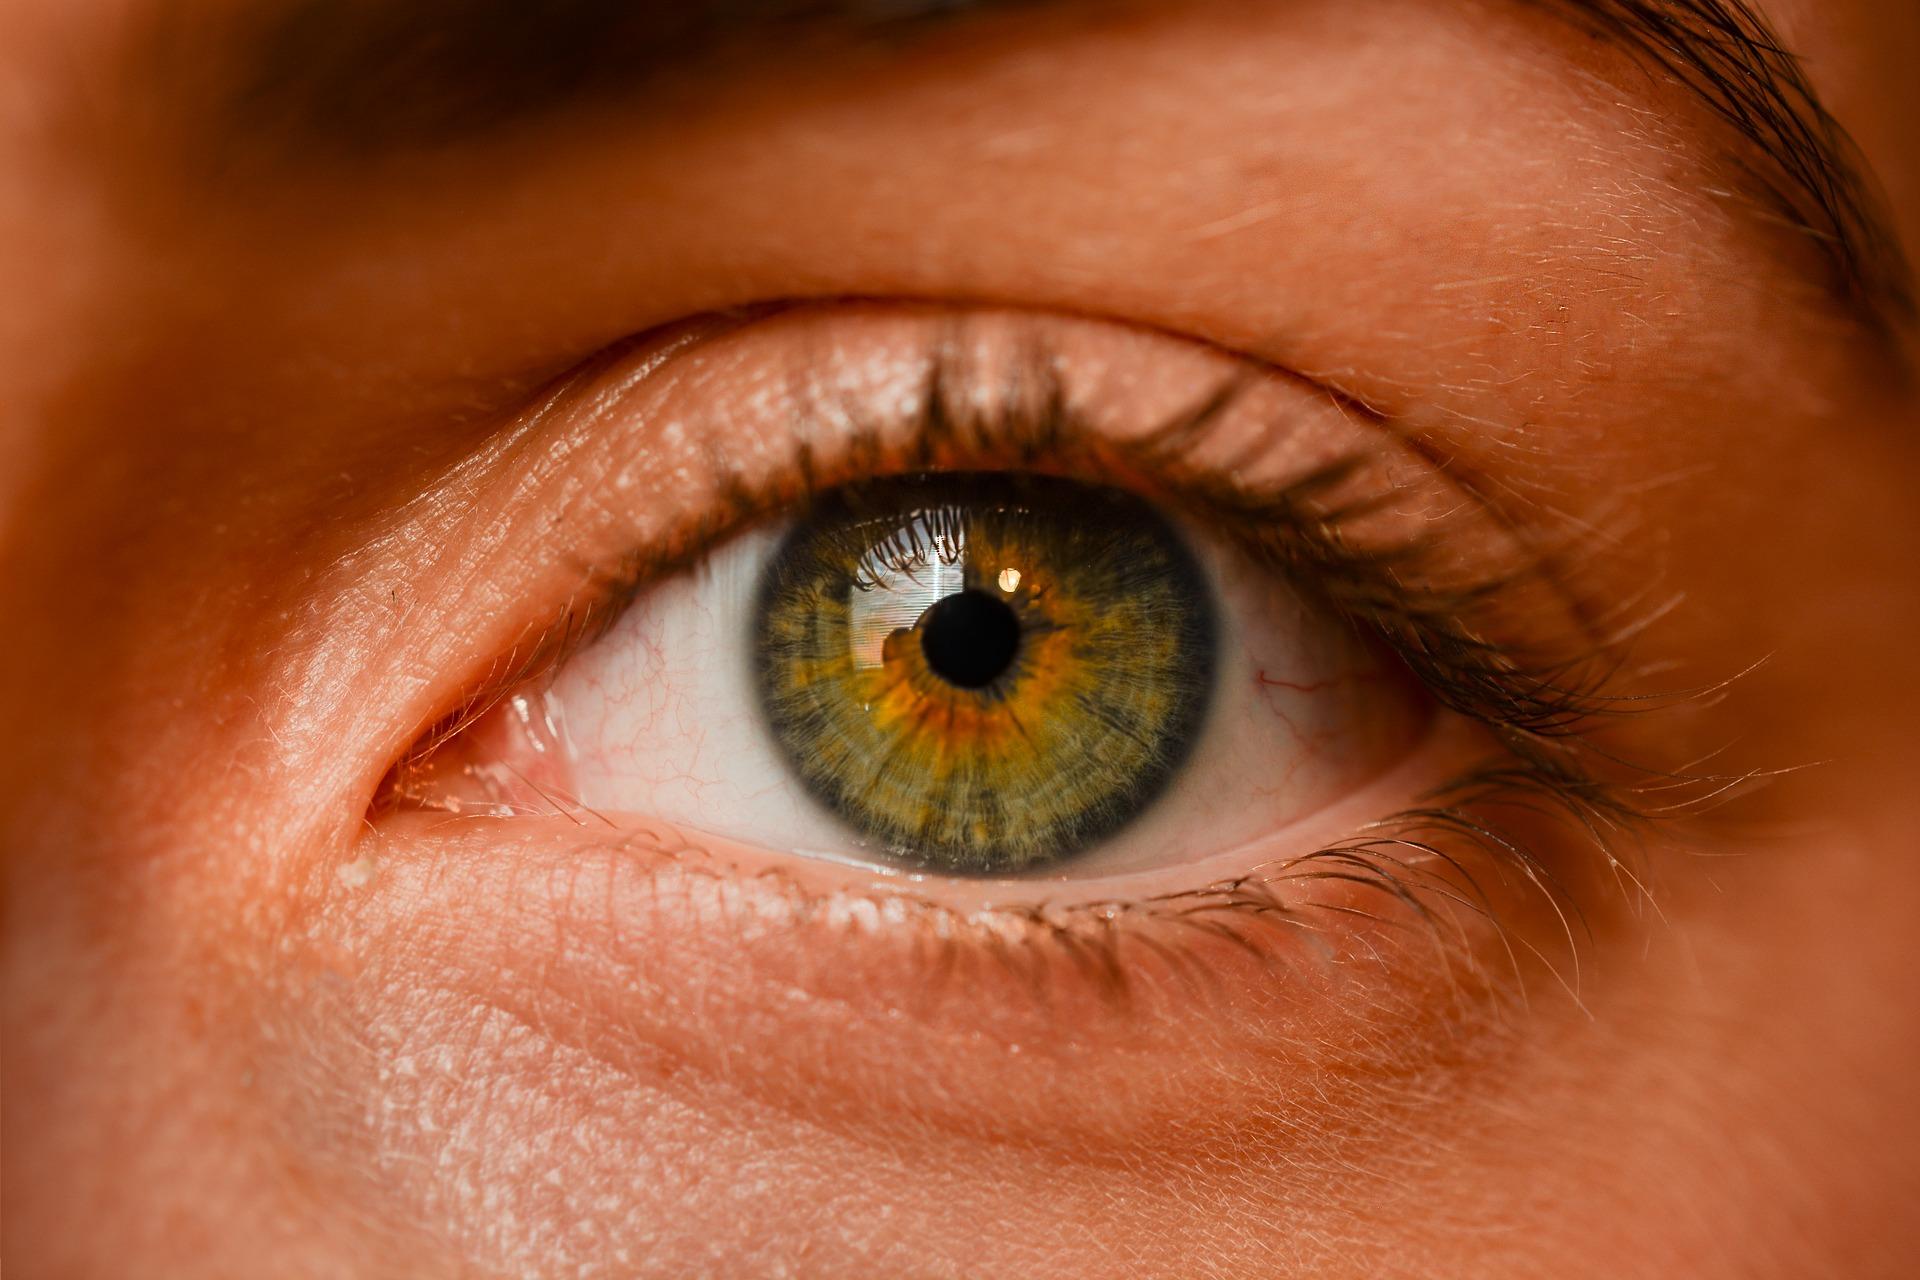 close up of eye and cheek